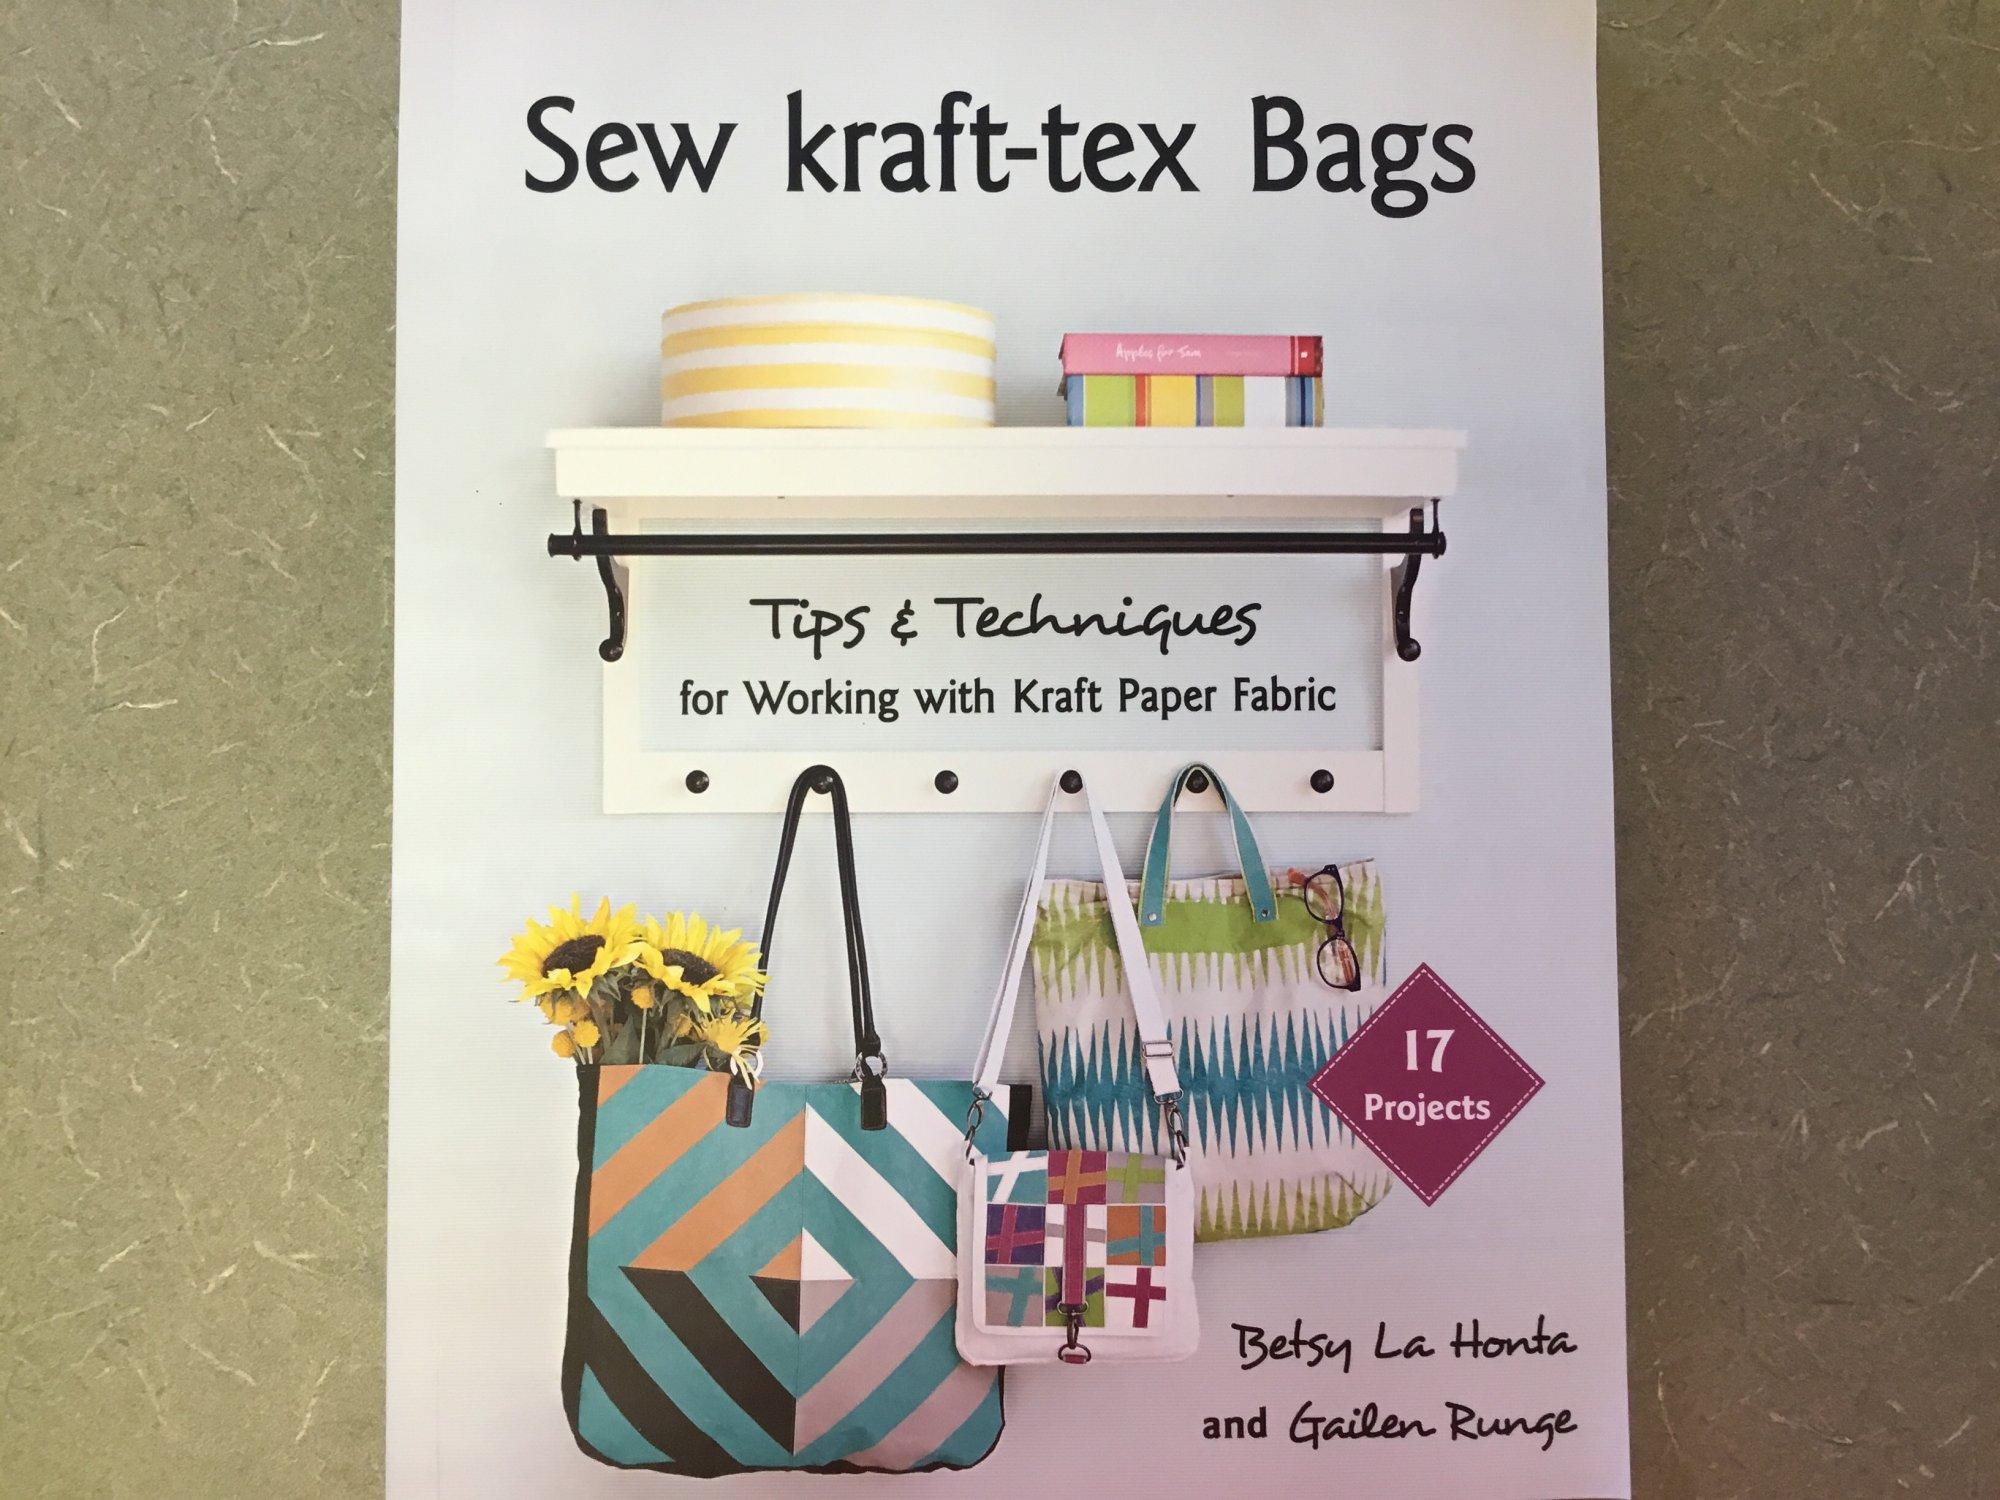 SEW KRAFT-TEX BAGS BOOK by Betsy La Honda and Galilean Runge 11320